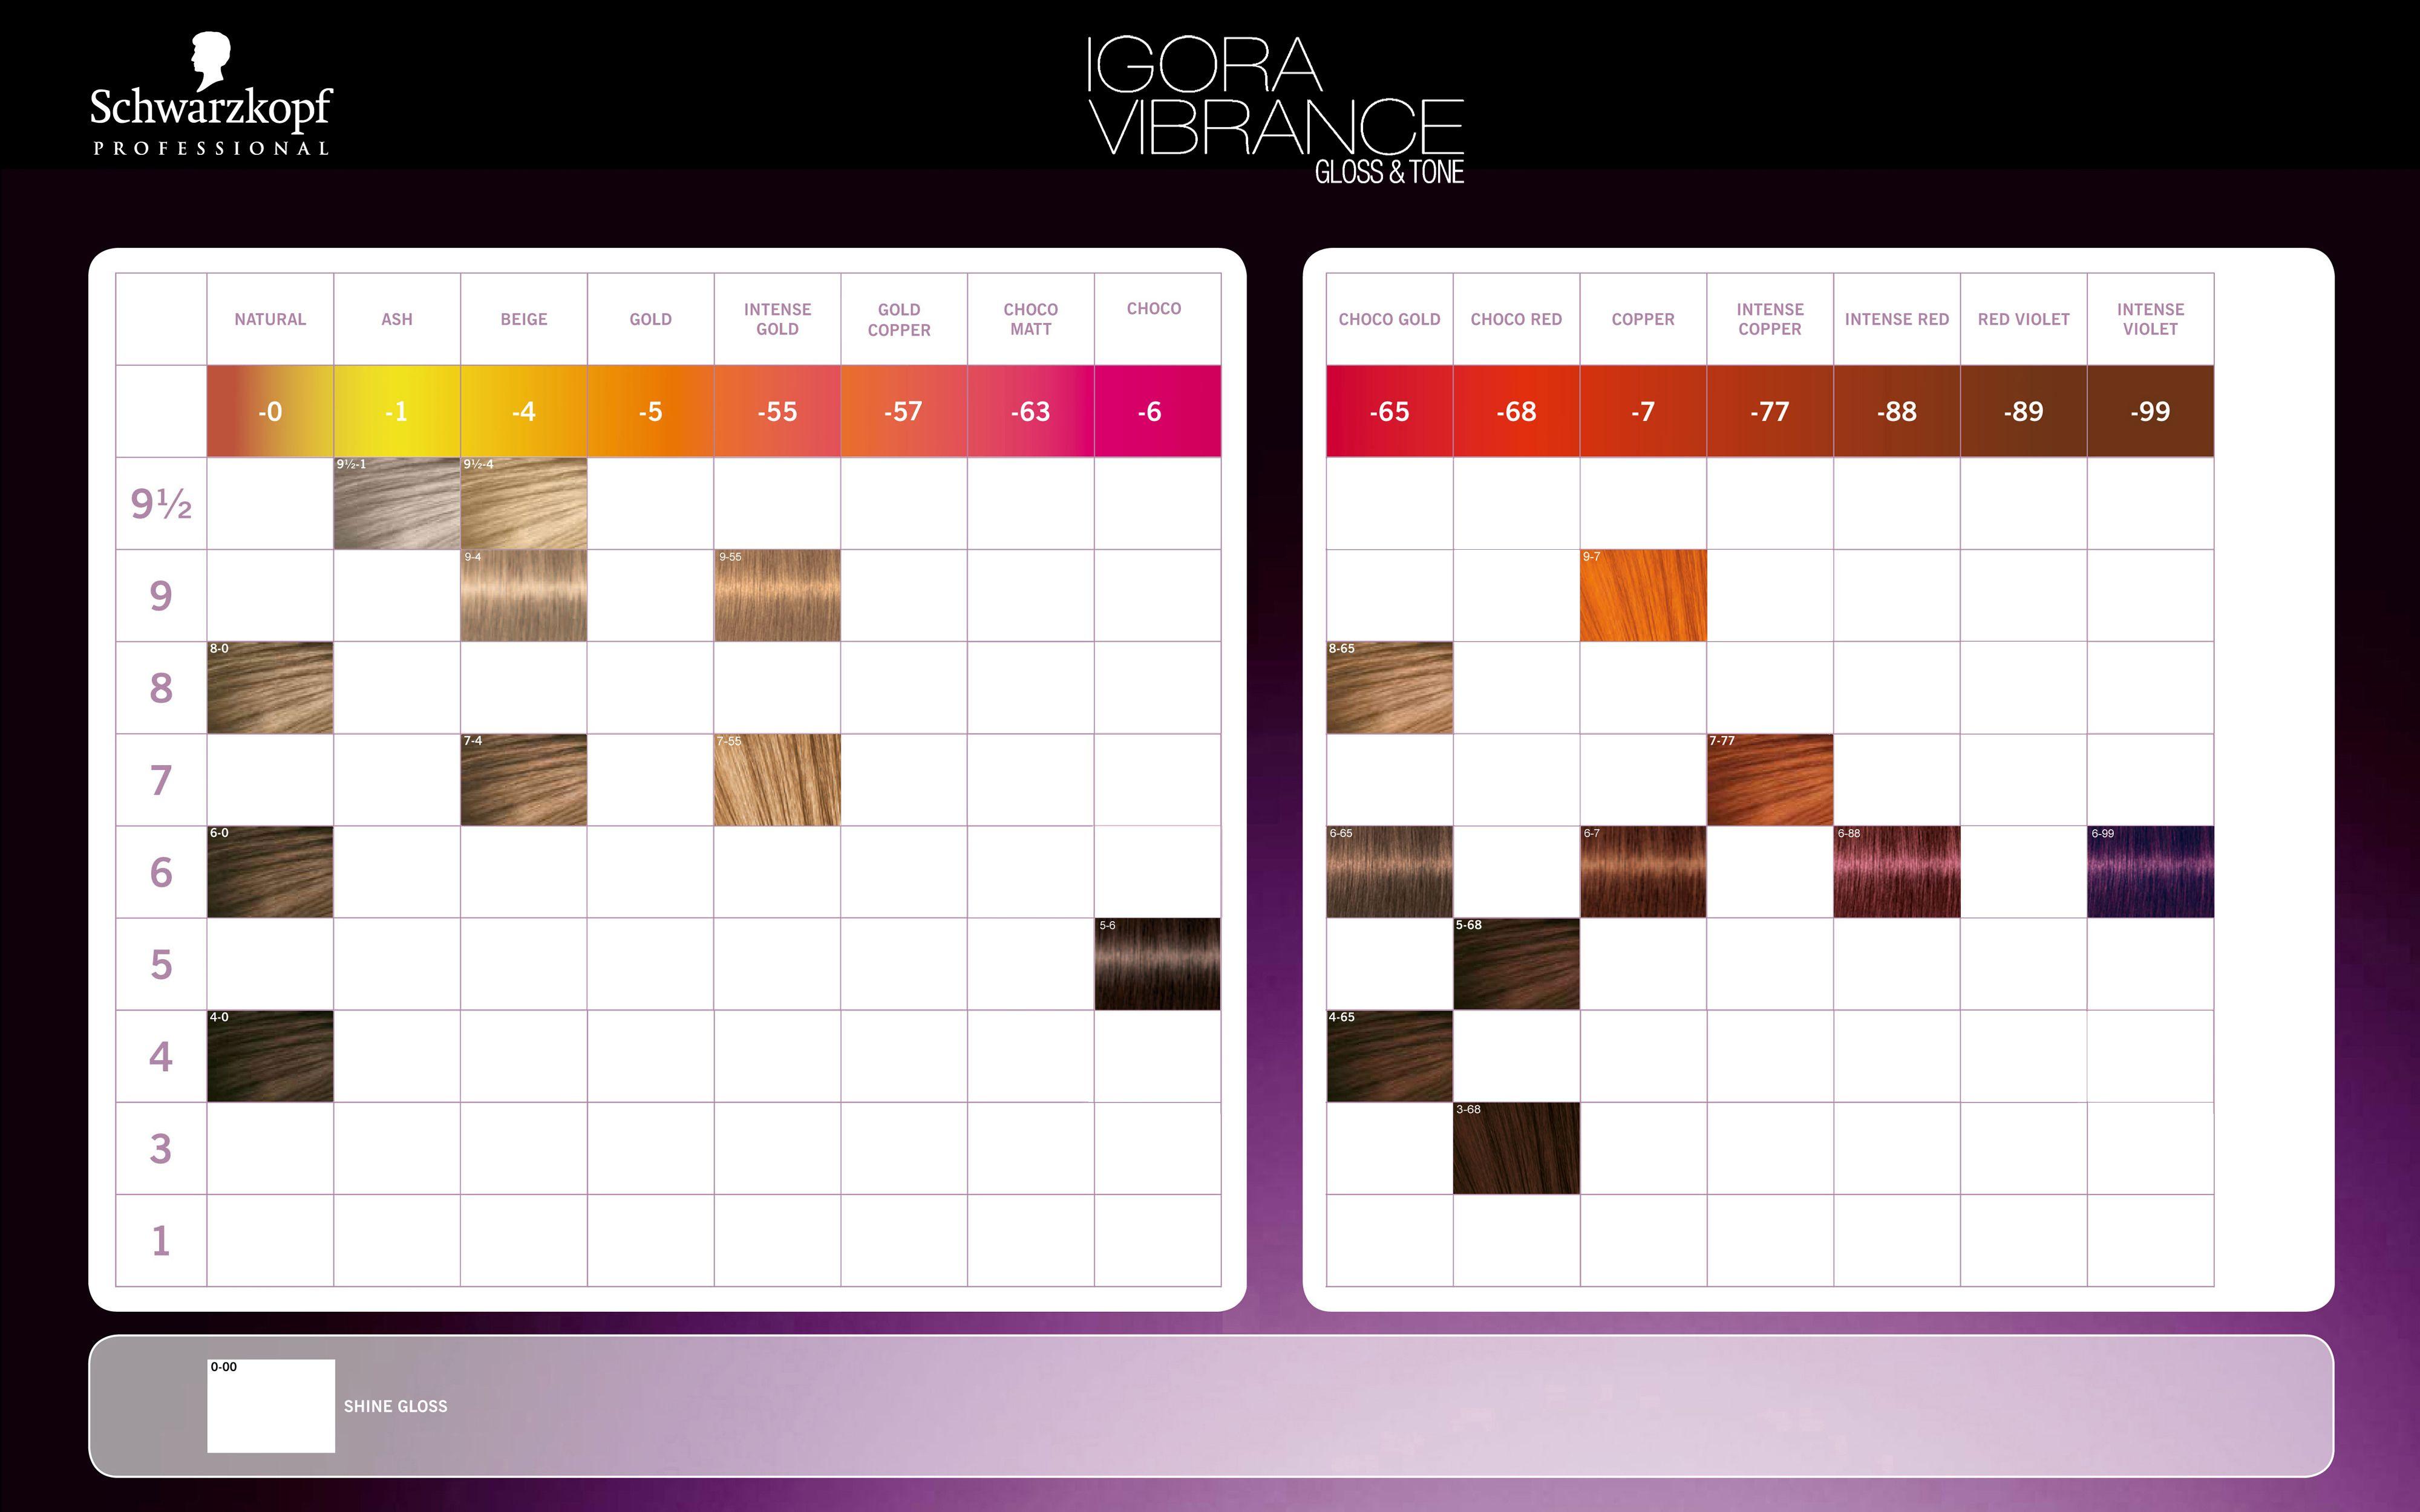 Schwarzkopf Color Chart 28 Images Igora Royal Hair